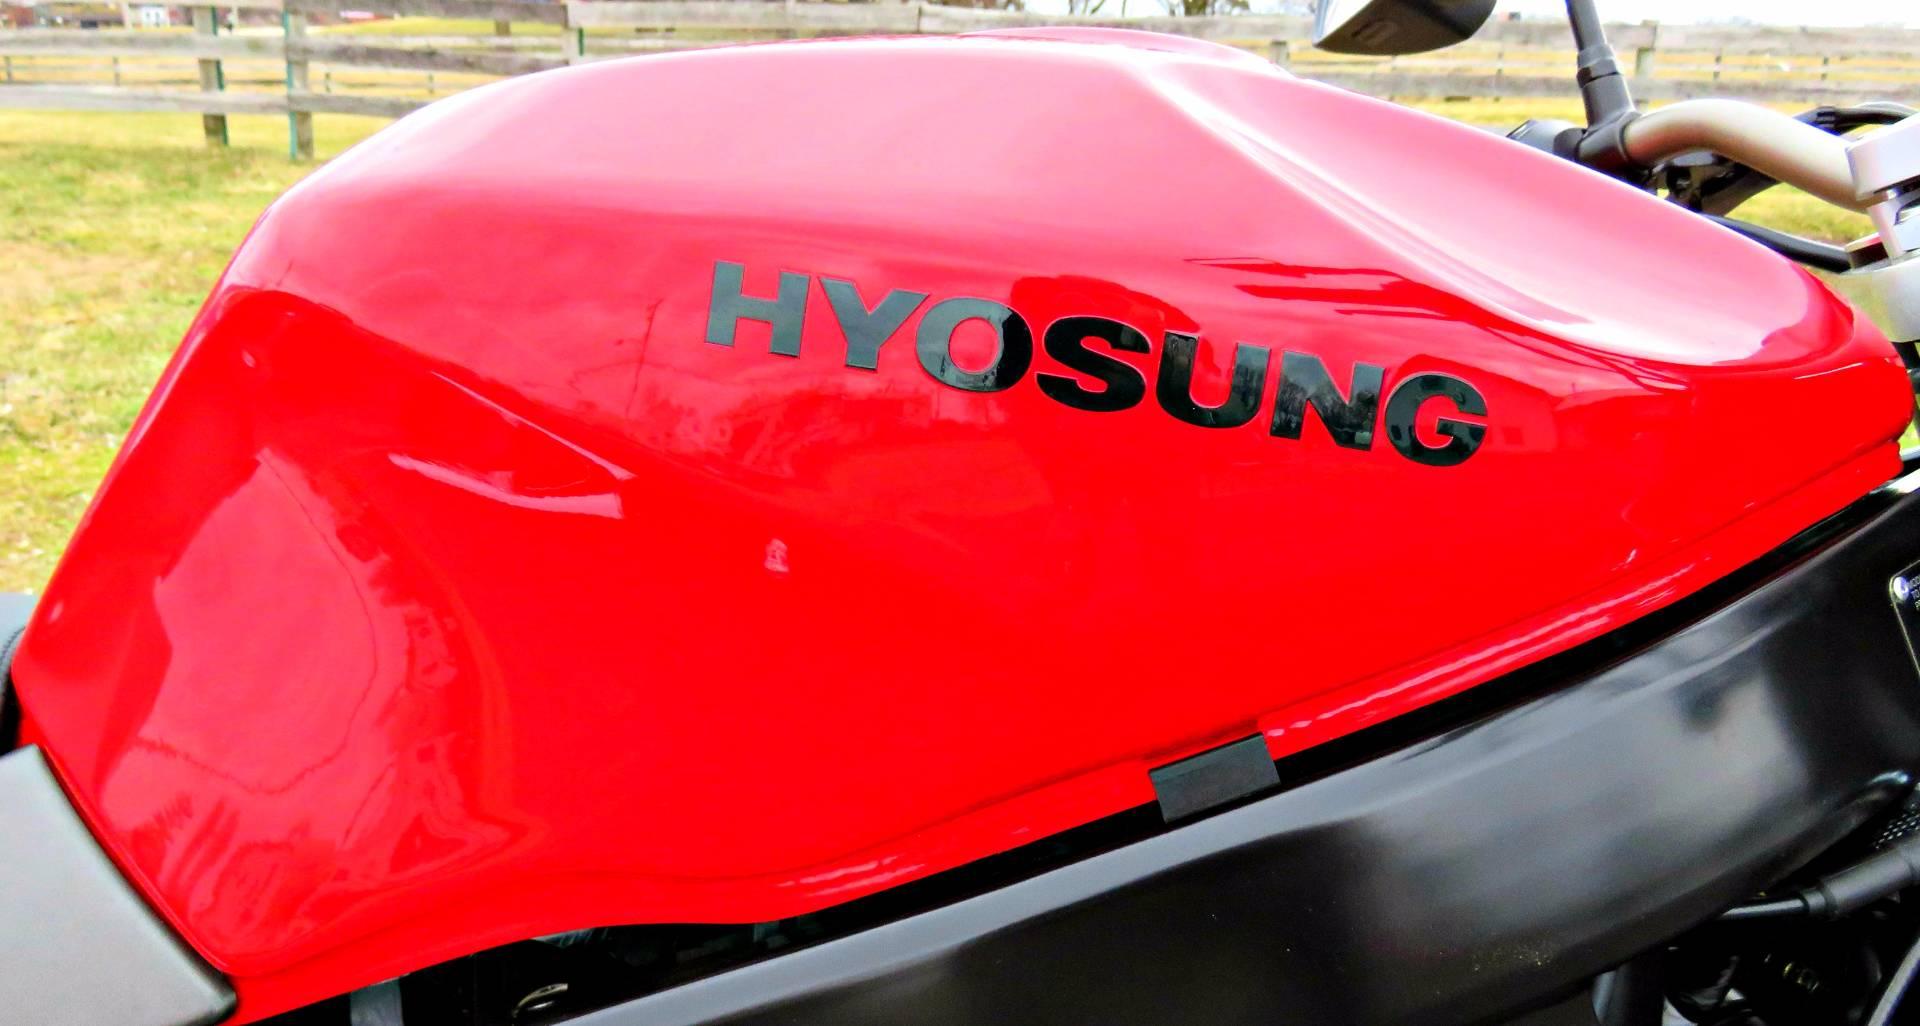 2016 Hyosung GT250 COMET in Marengo, Illinois